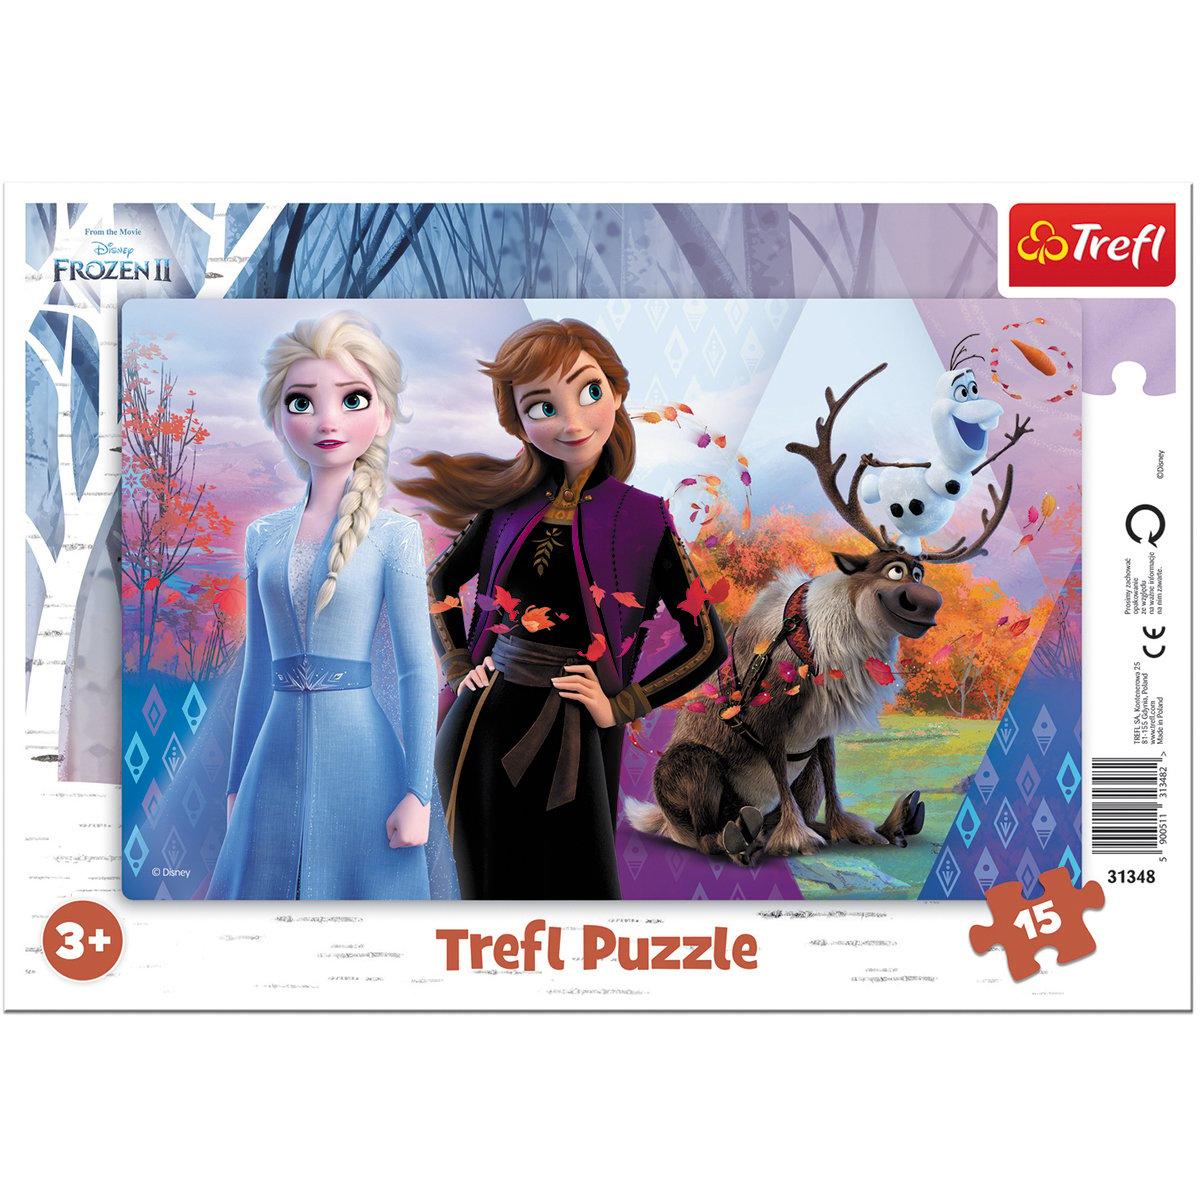 Puzzle Trefl 15 piese in rama, Lumea magica a Annei si Elsei, Disney Frozen 2